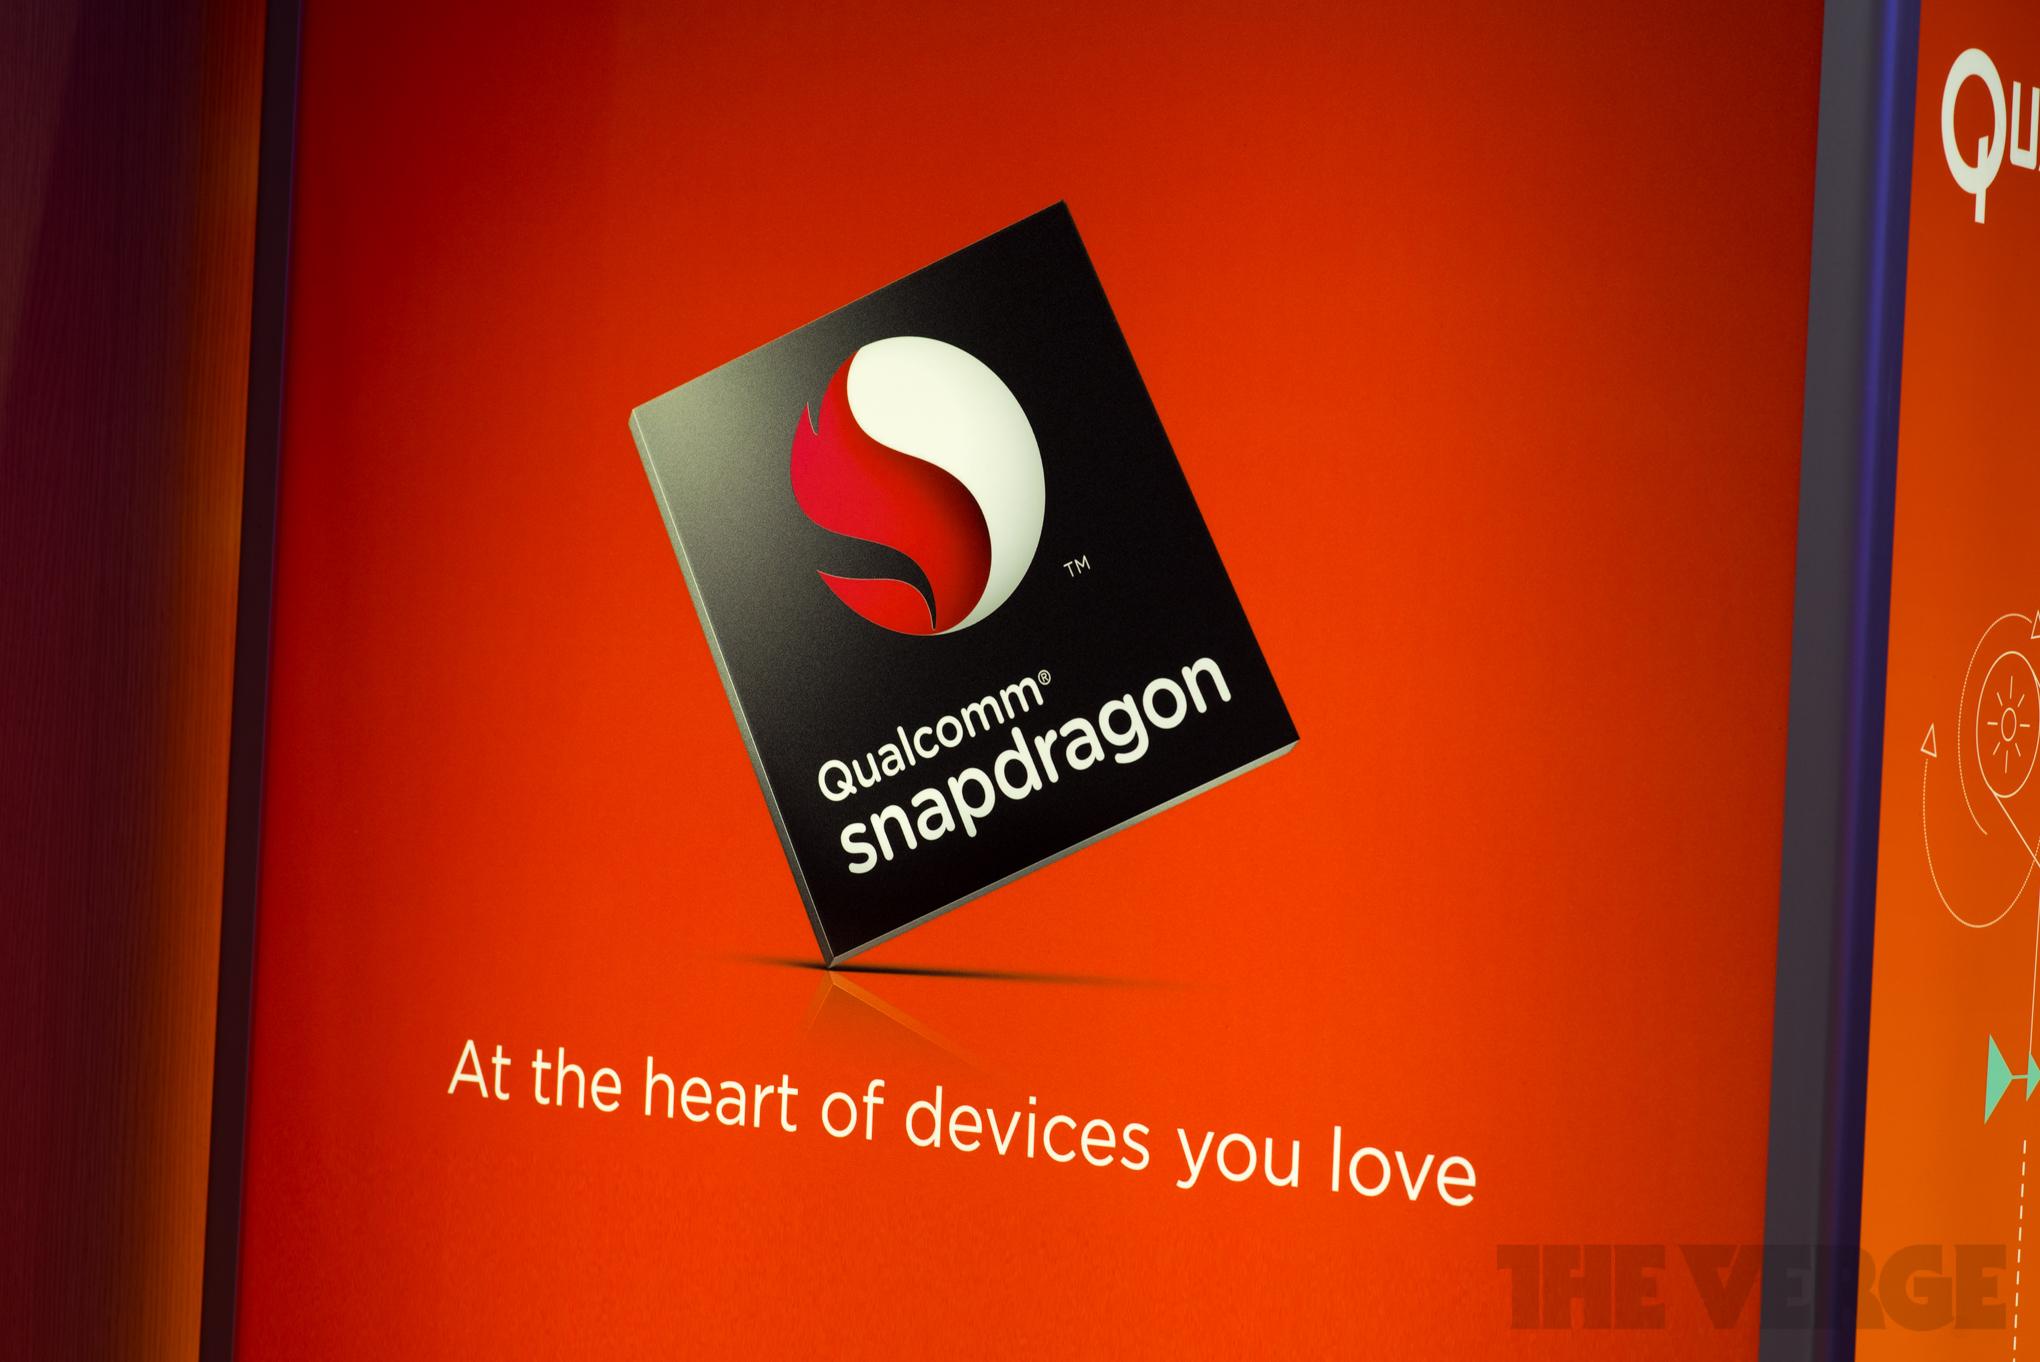 Qualcomm Snapdragon (STOCK)